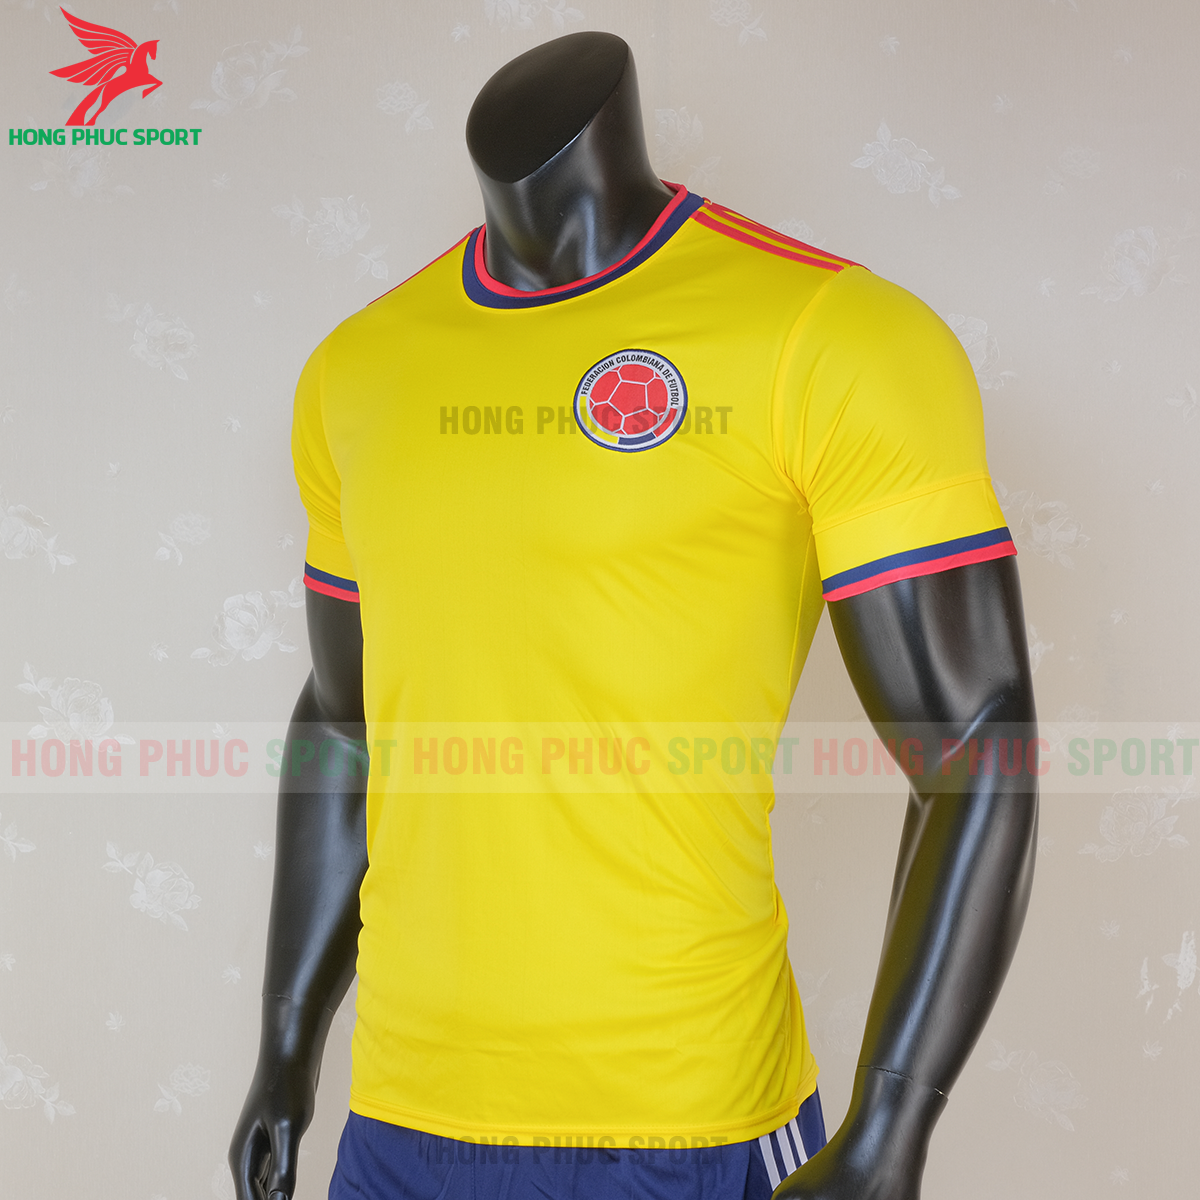 https://cdn.hongphucsport.com/unsafe/s4.shopbay.vn/files/285/ao-bong-da-tuyen-colombia-2020-san-khach-3-5f7163bd15ea1.png